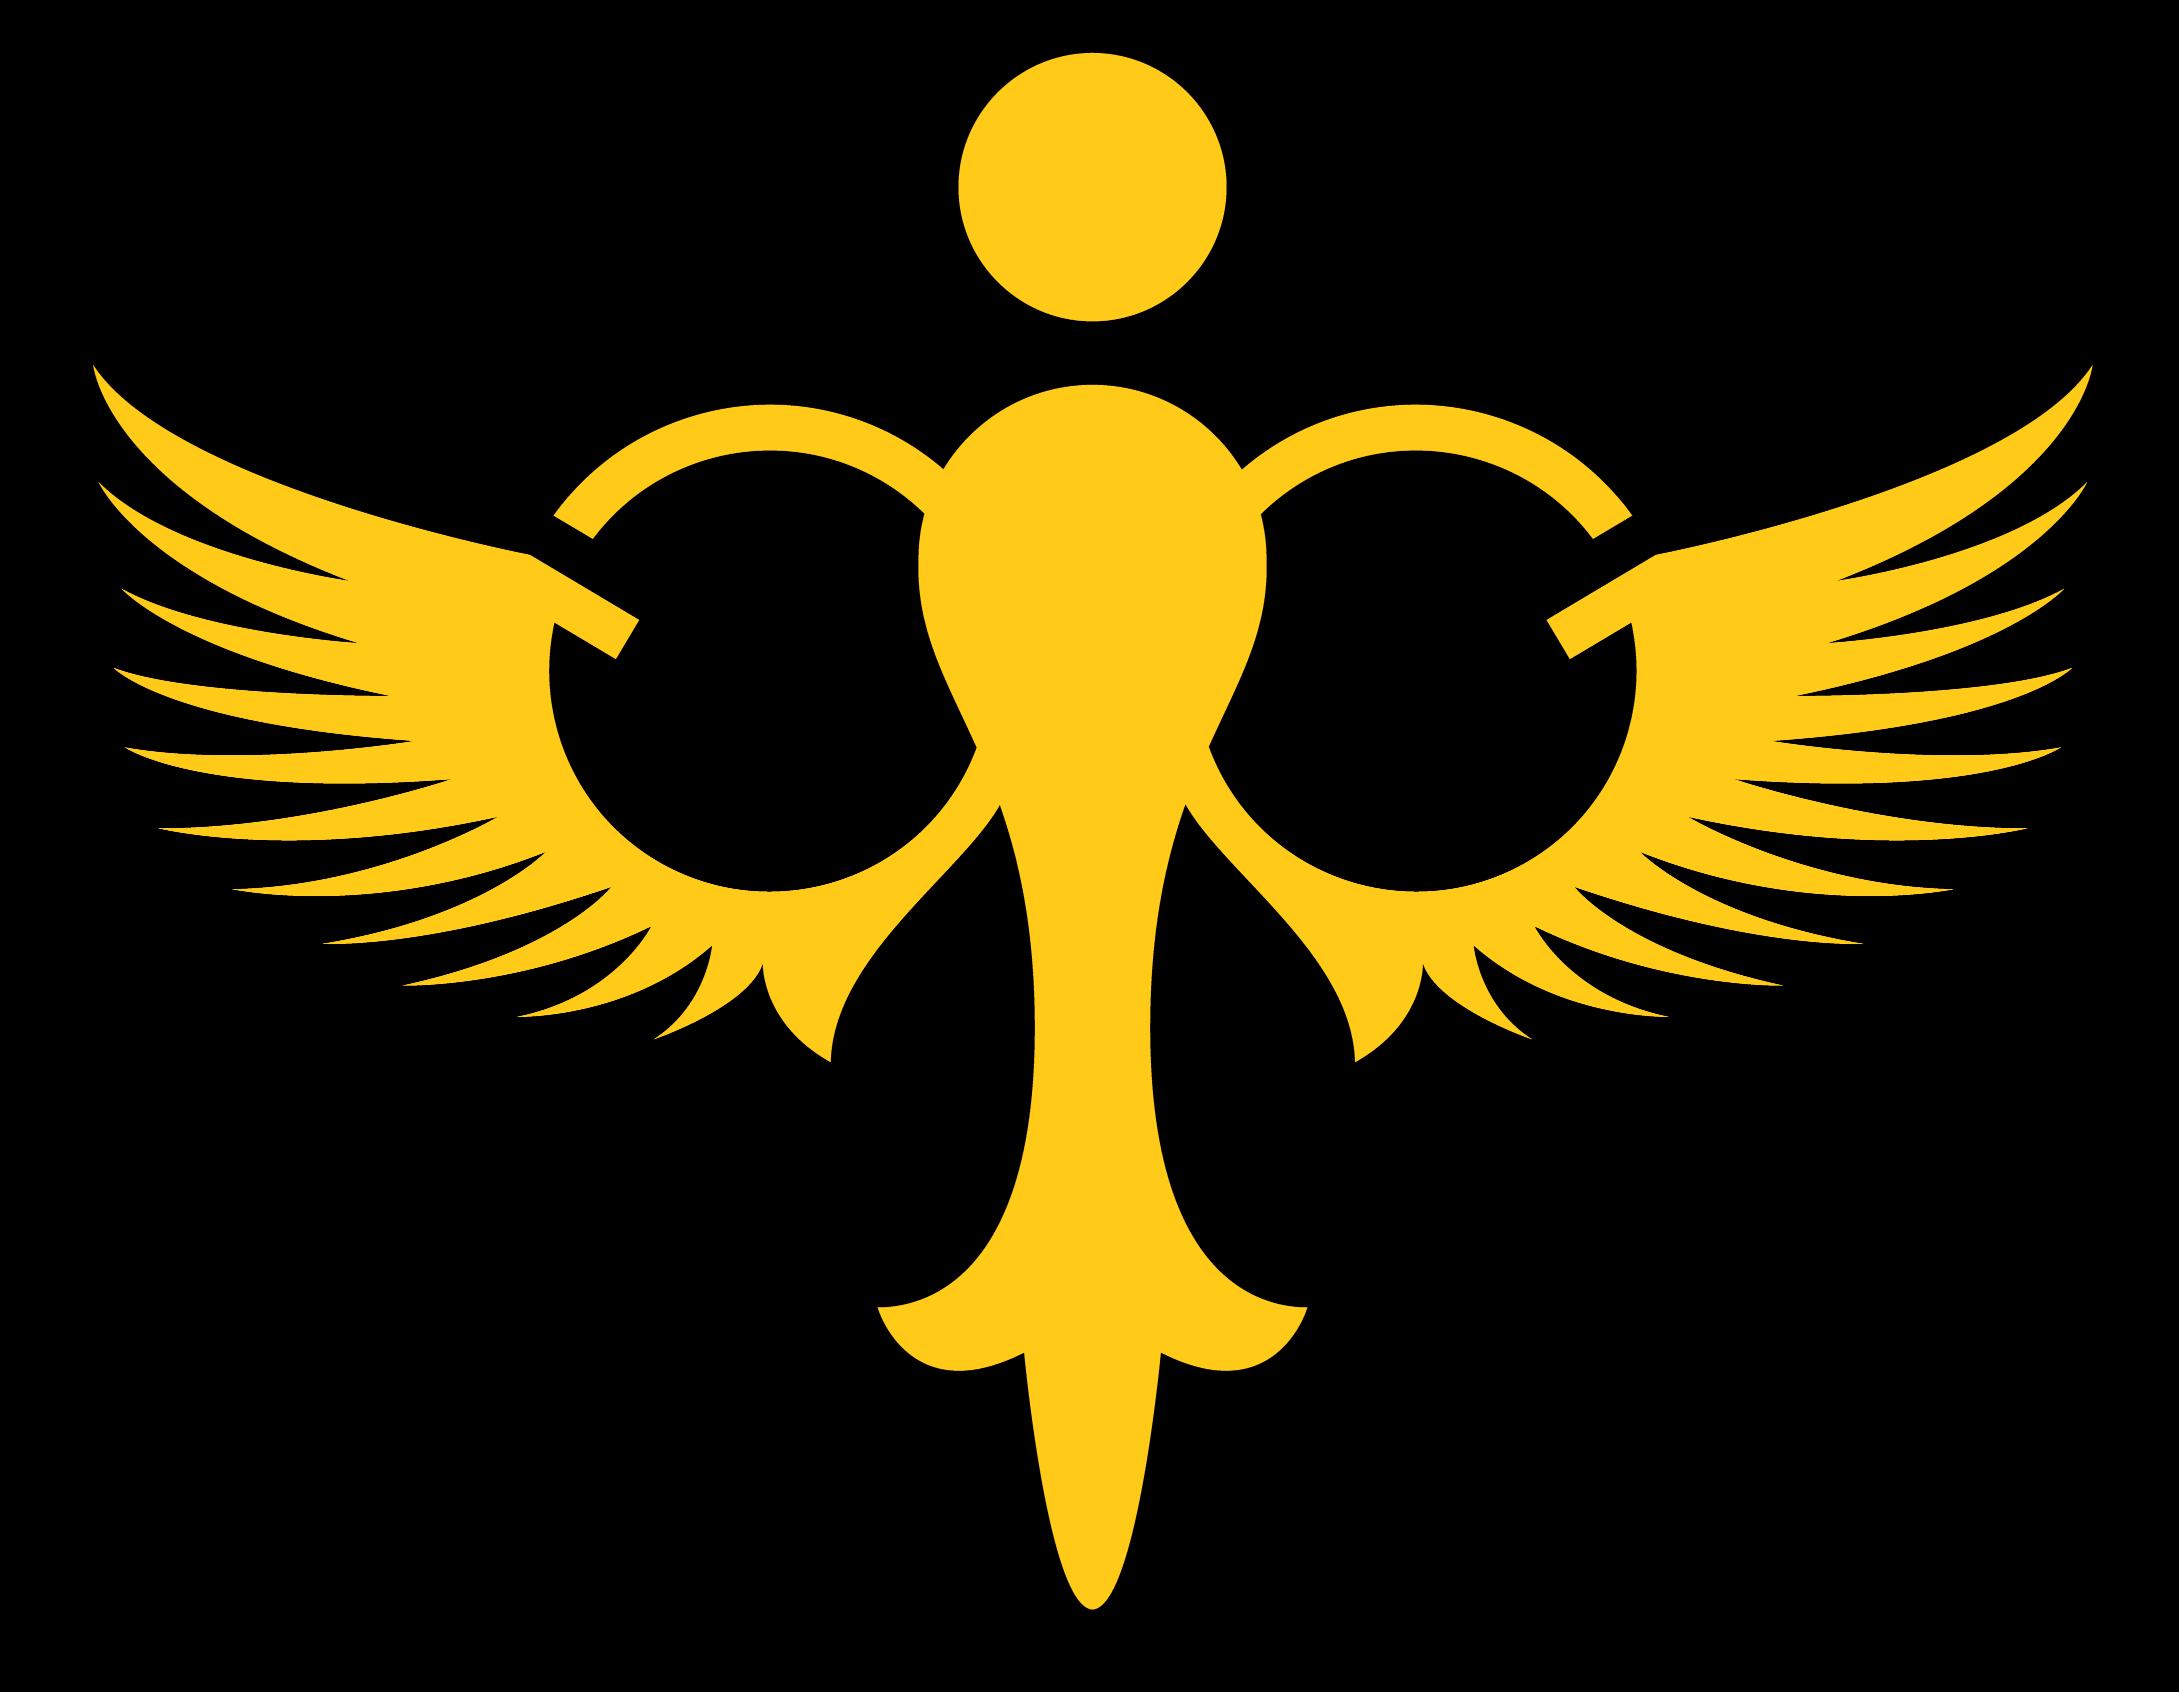 Global_Gauntlet_logo2